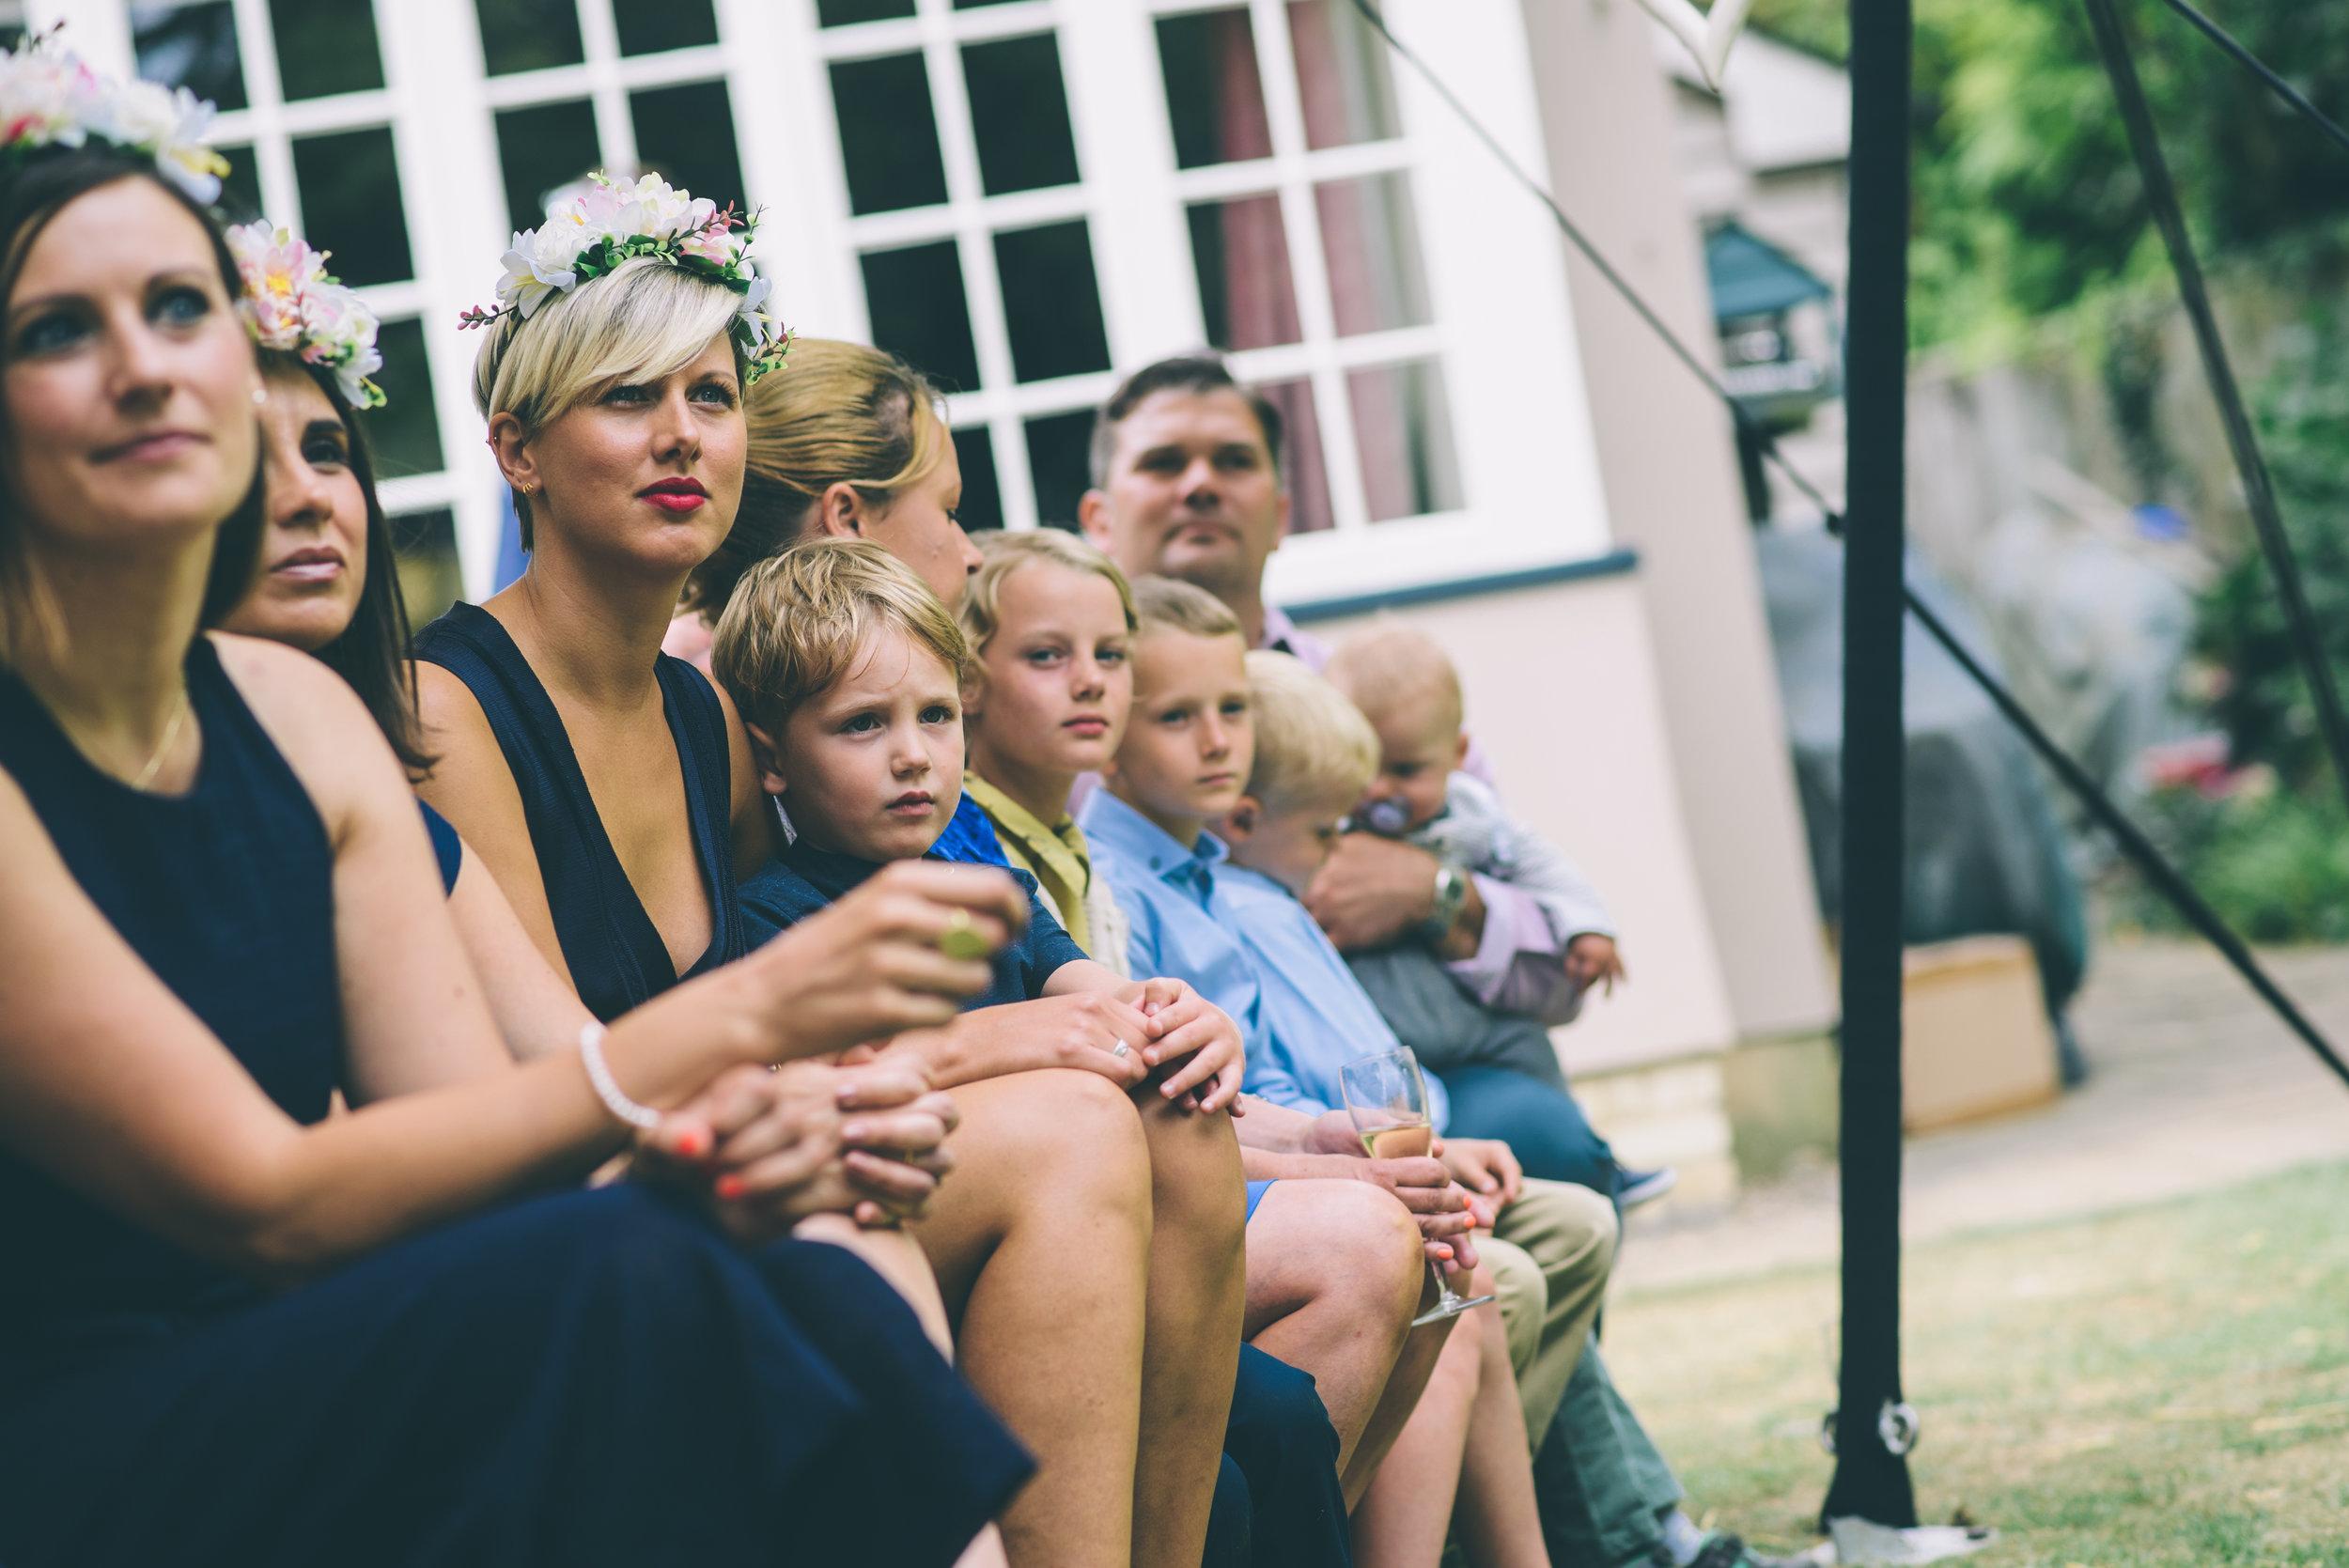 Garden Wedding photography Barley Herefordshire - Tracy + Matt -169.jpg